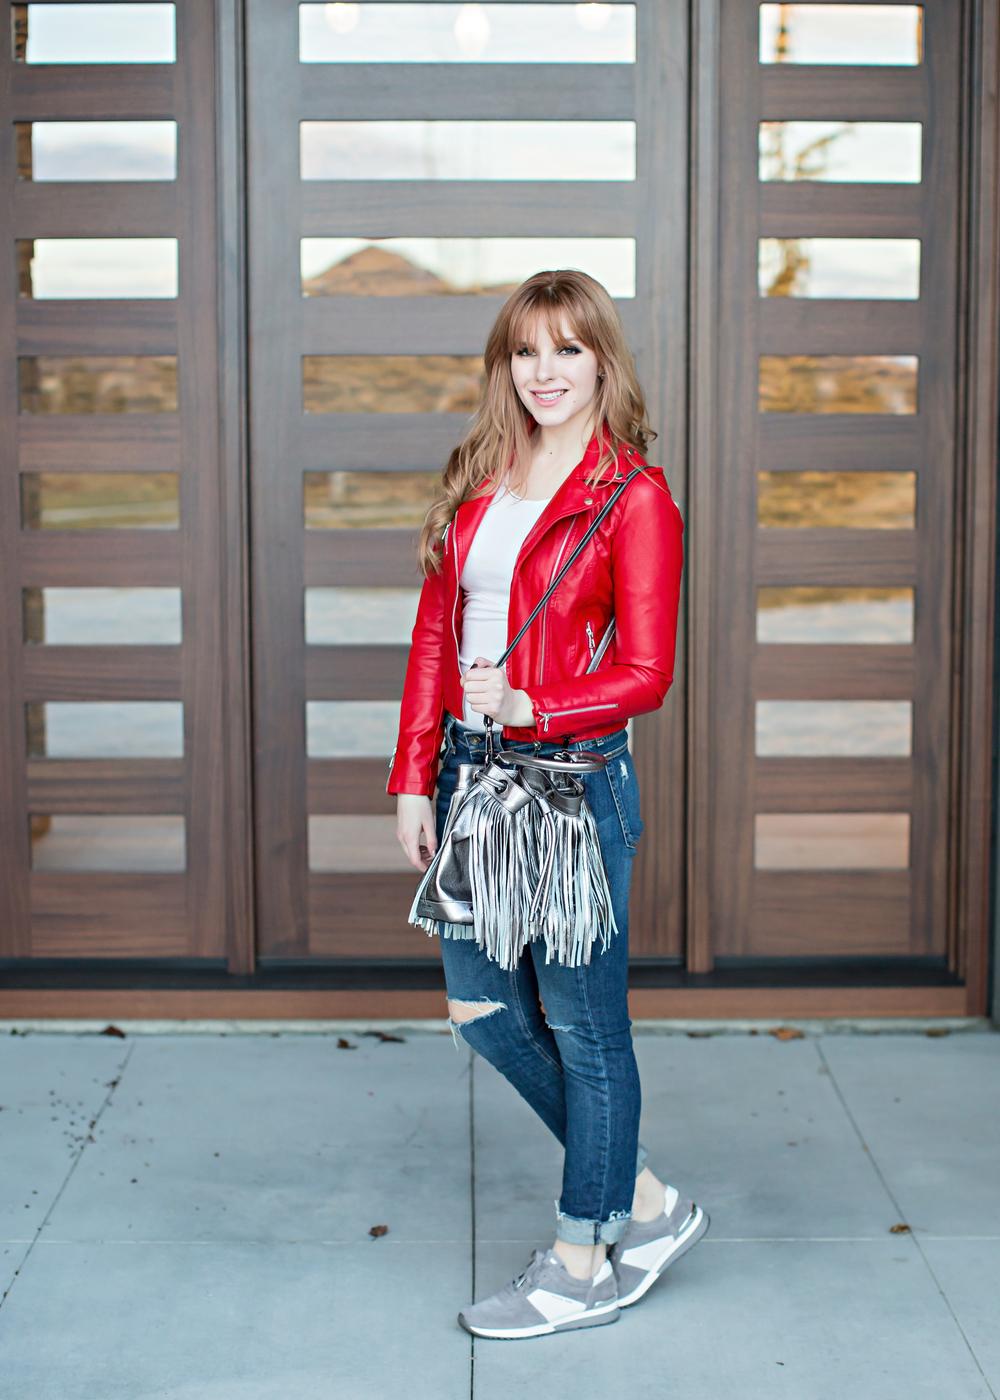 Jacket: Romwe   Tee: Forever21   Jeans: Rag&Bone skinny   Bag: Milly   Sneakers: Michael Kors   Photos: Tara Lynn Photography